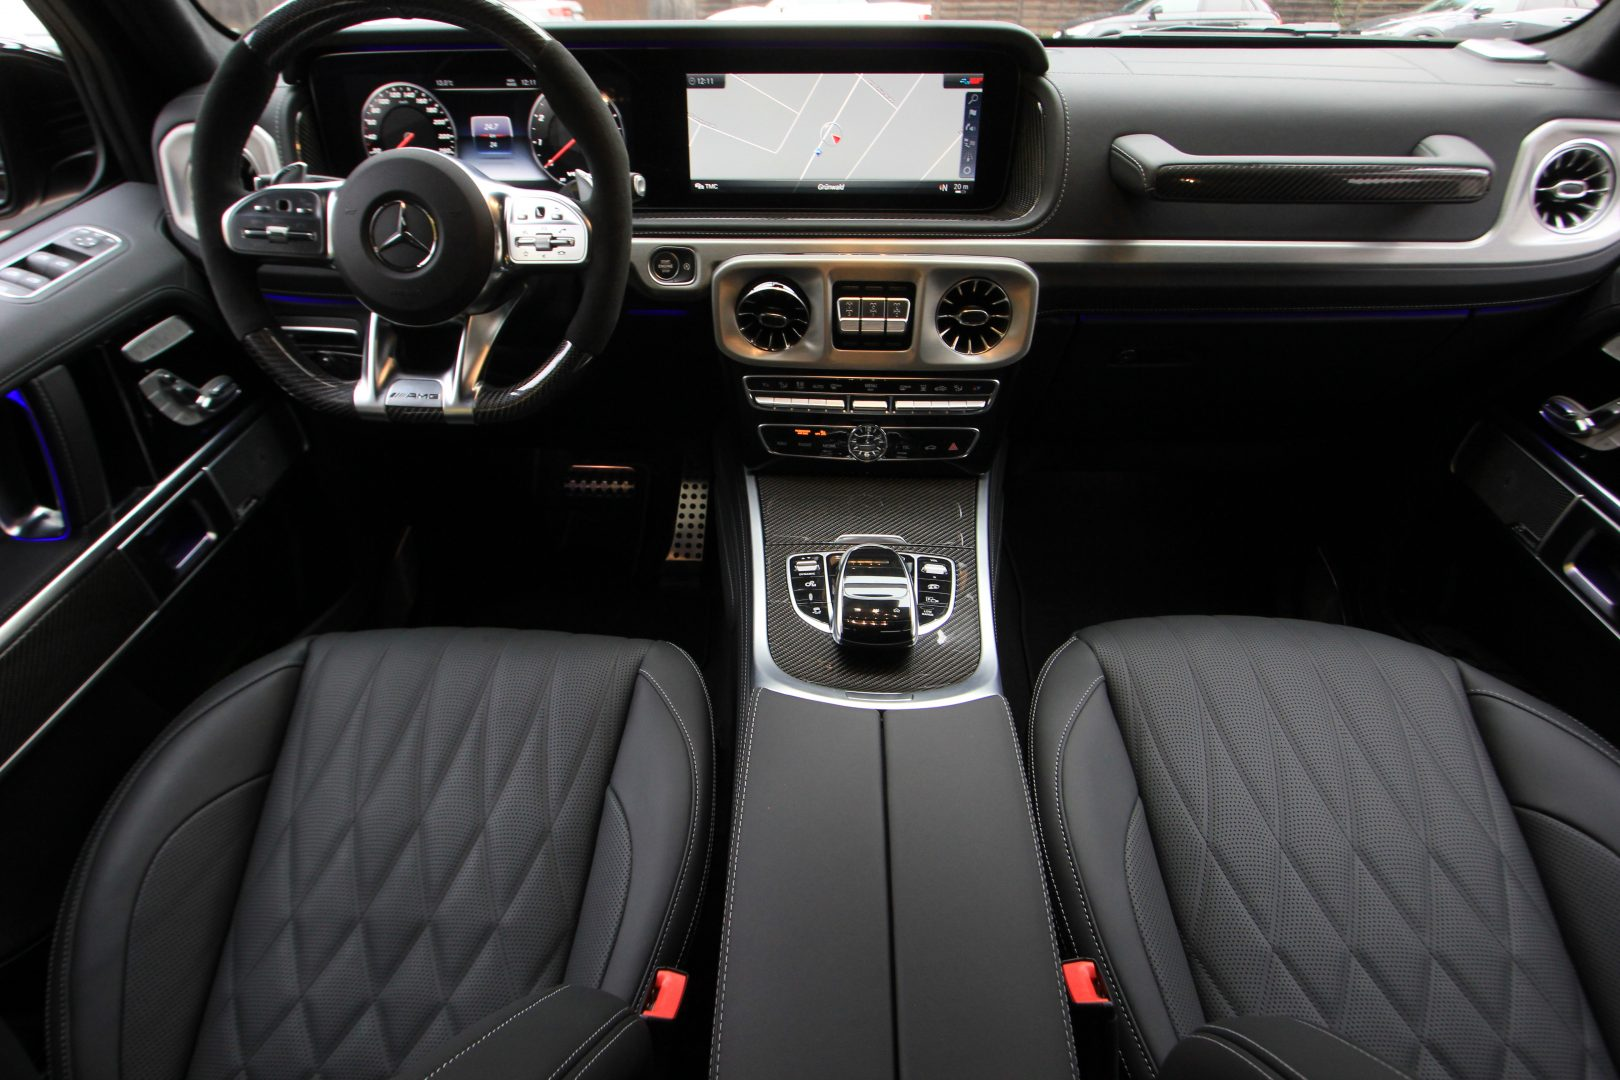 AIL Mercedes-Benz G 63 AMG Carbon Paket Burmester 2